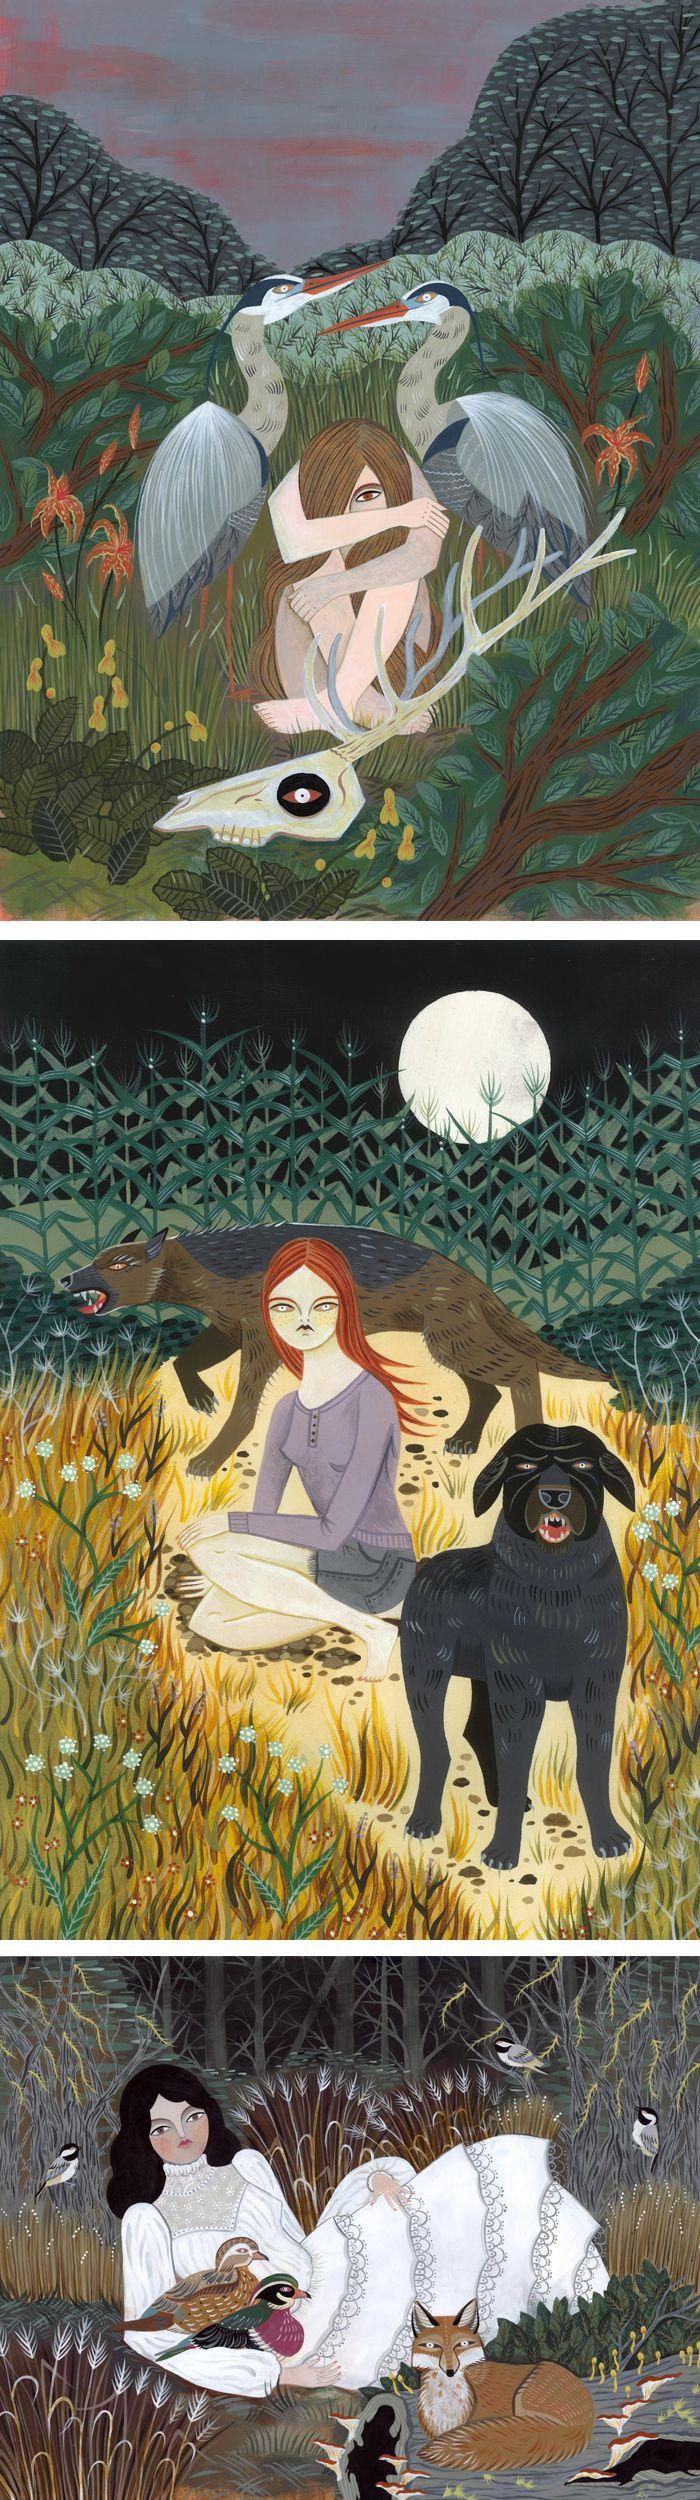 Magical Illustrations by Lisa Vanin // folklore illustrations